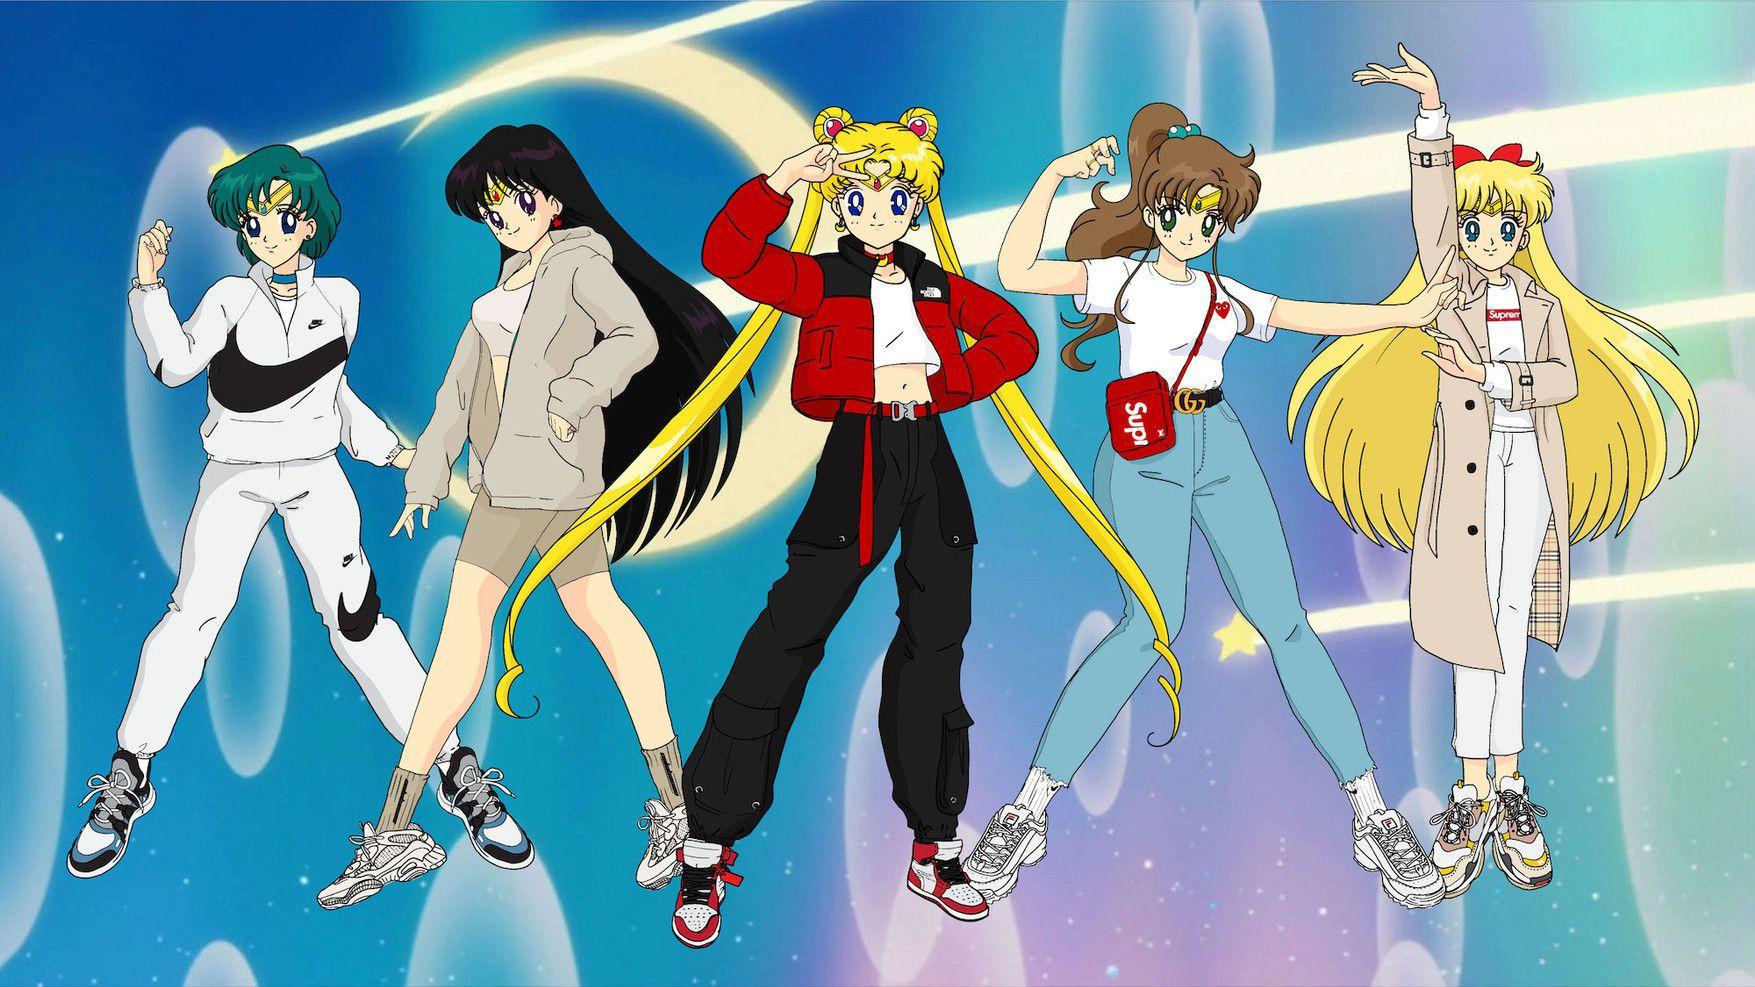 Sailor Moon icona di streetstyle - Neomag.